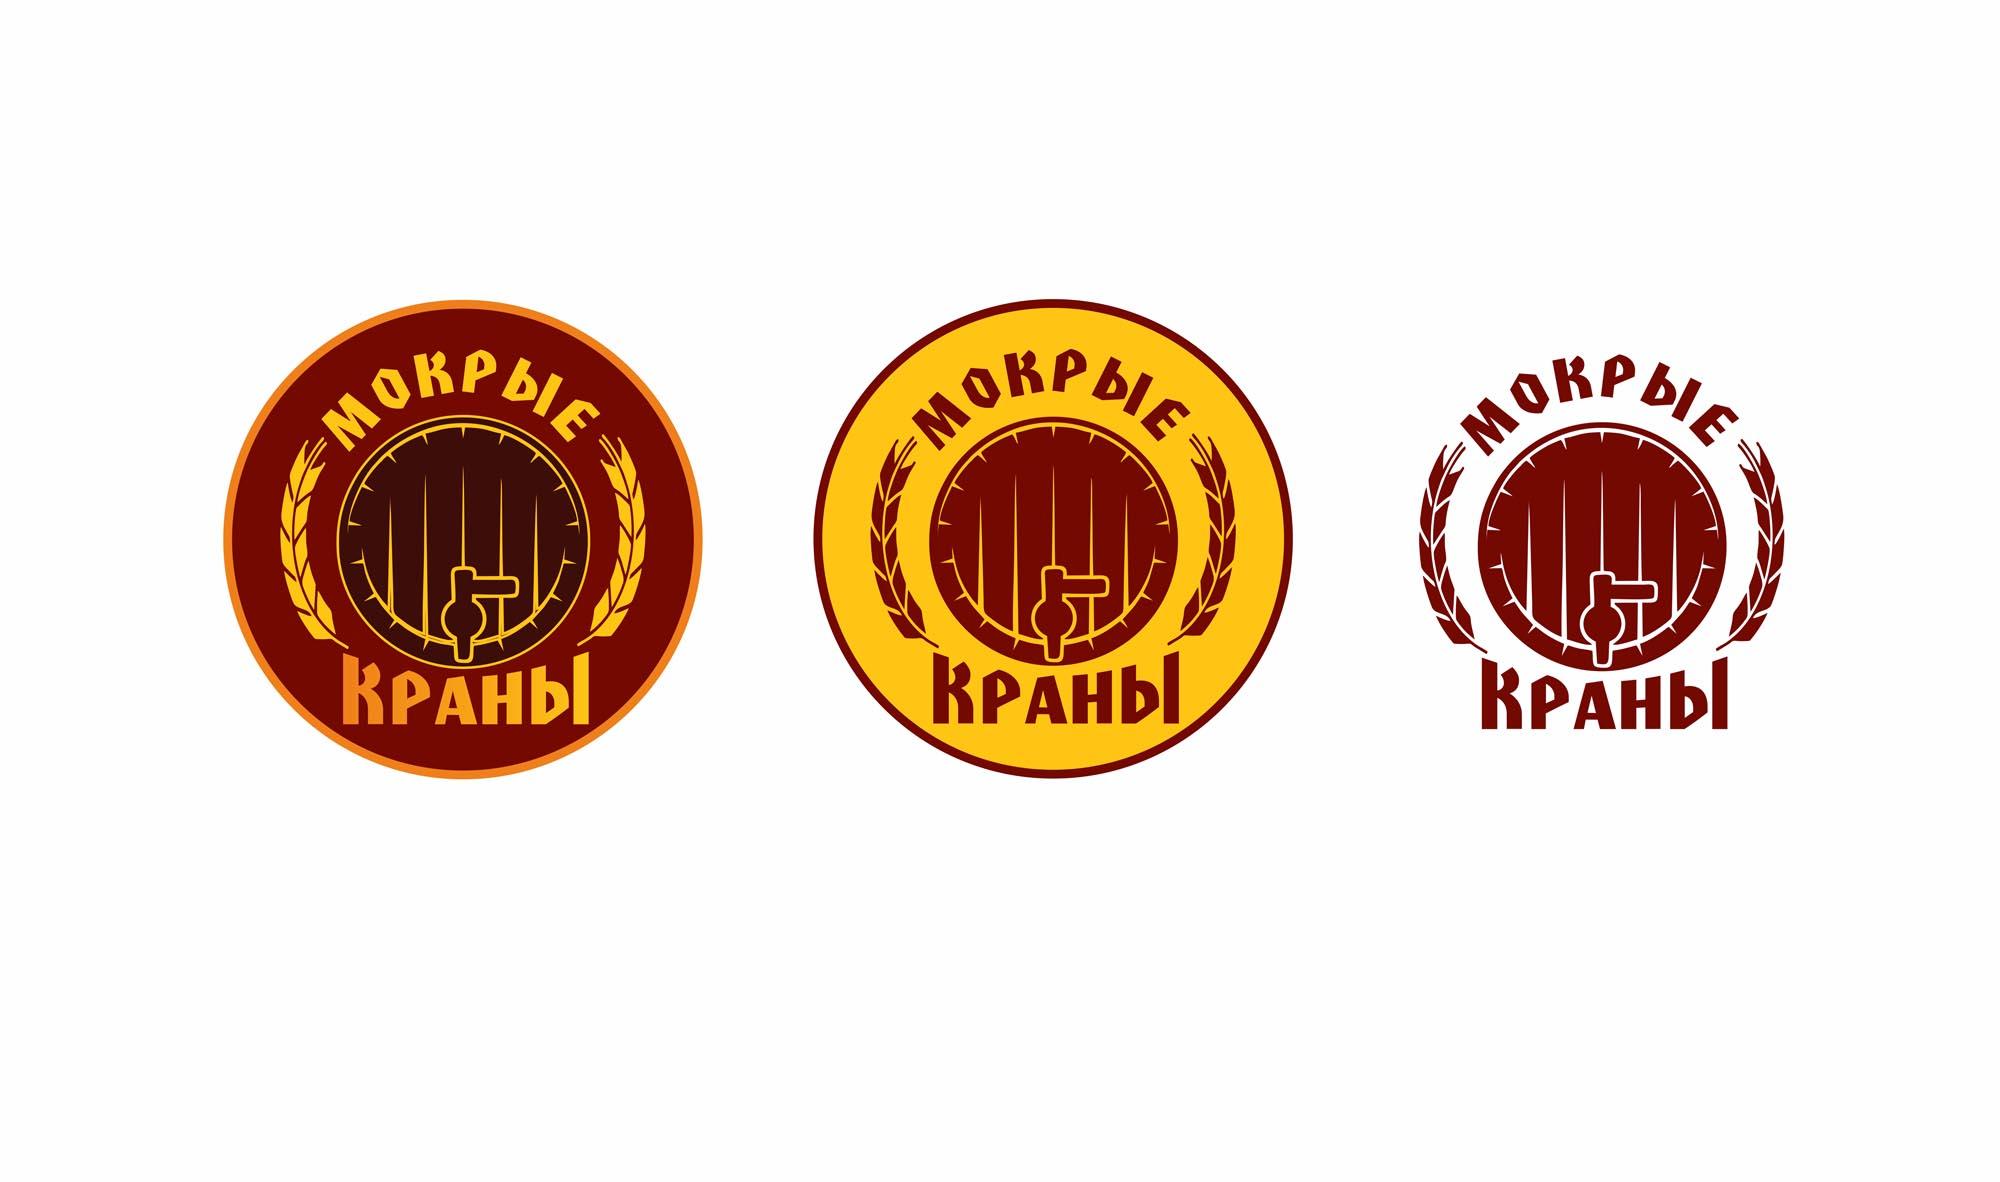 Вывеска/логотип для пивного магазина фото f_095601e1461462f8.jpg